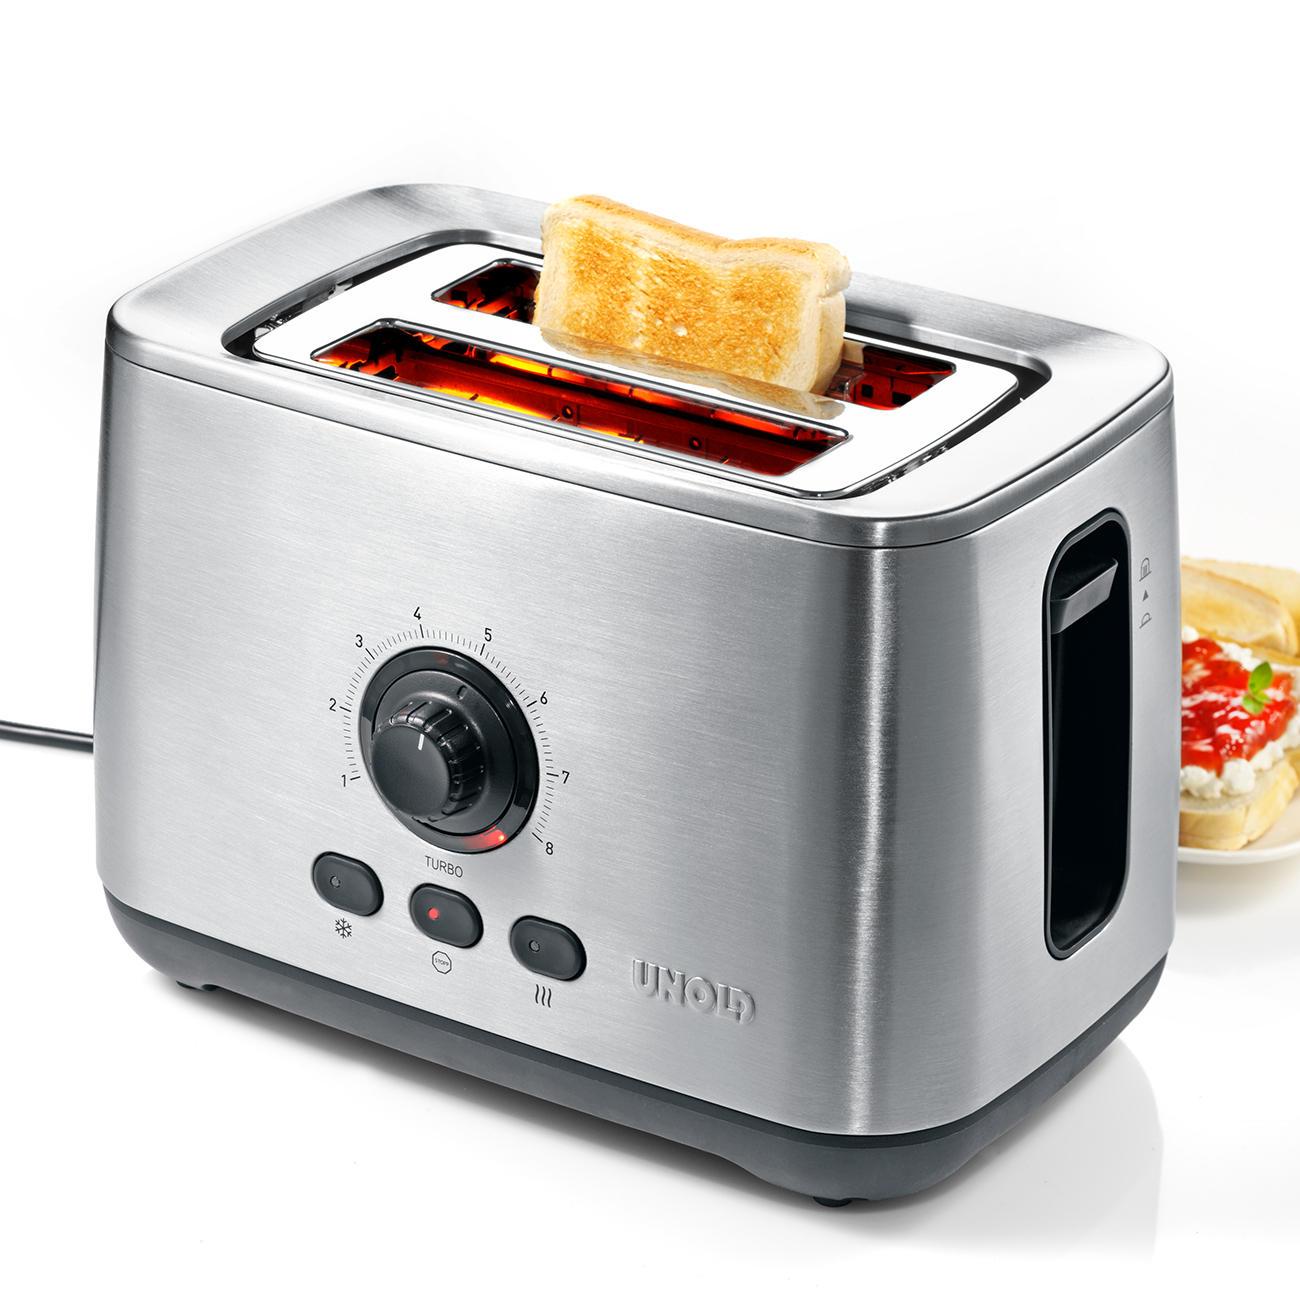 unold turbo toaster eco 3 jahre garantie pro idee. Black Bedroom Furniture Sets. Home Design Ideas